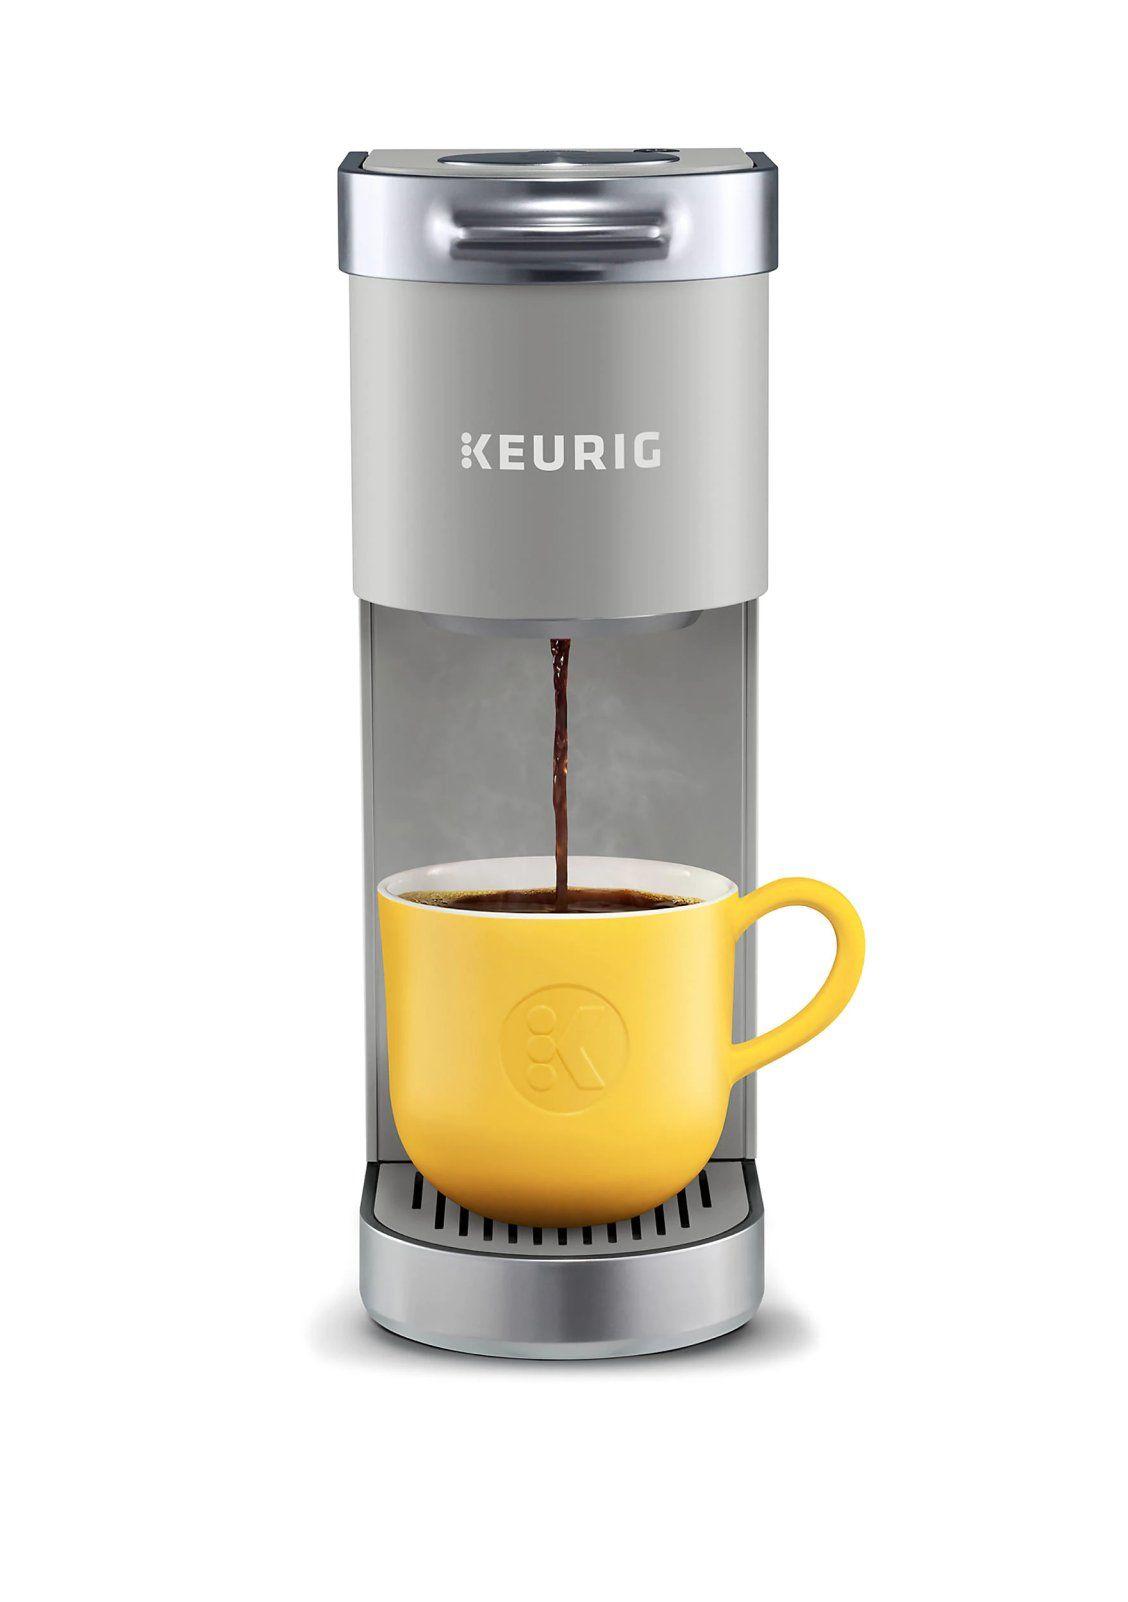 Keurig® KMini Plus Single Serve Coffee Maker Single